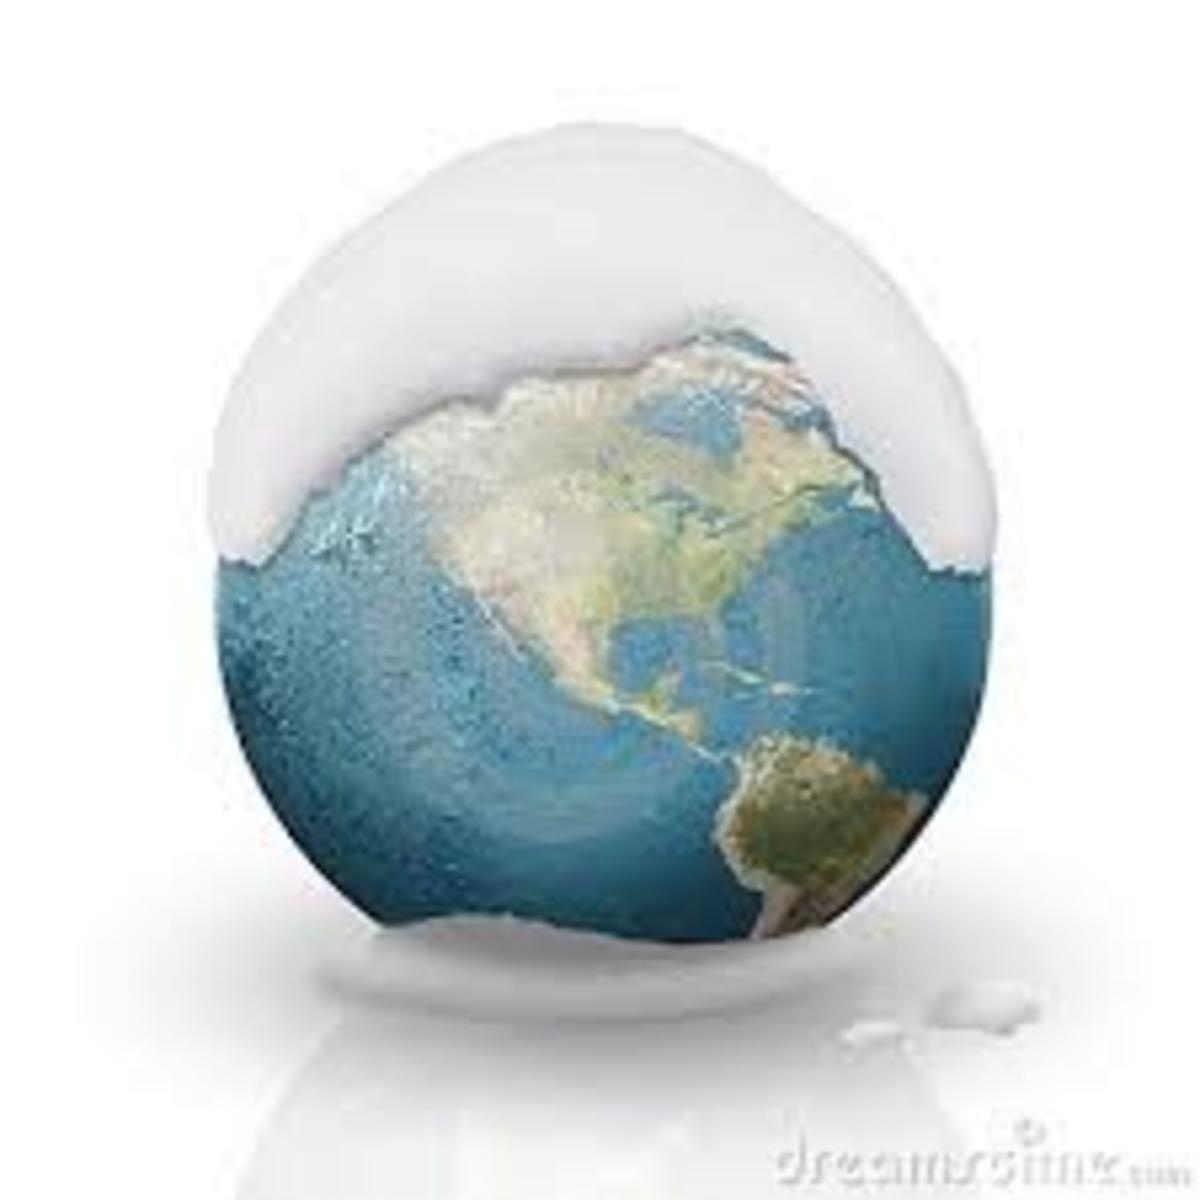 Global Warming: Fact or Fallacy?